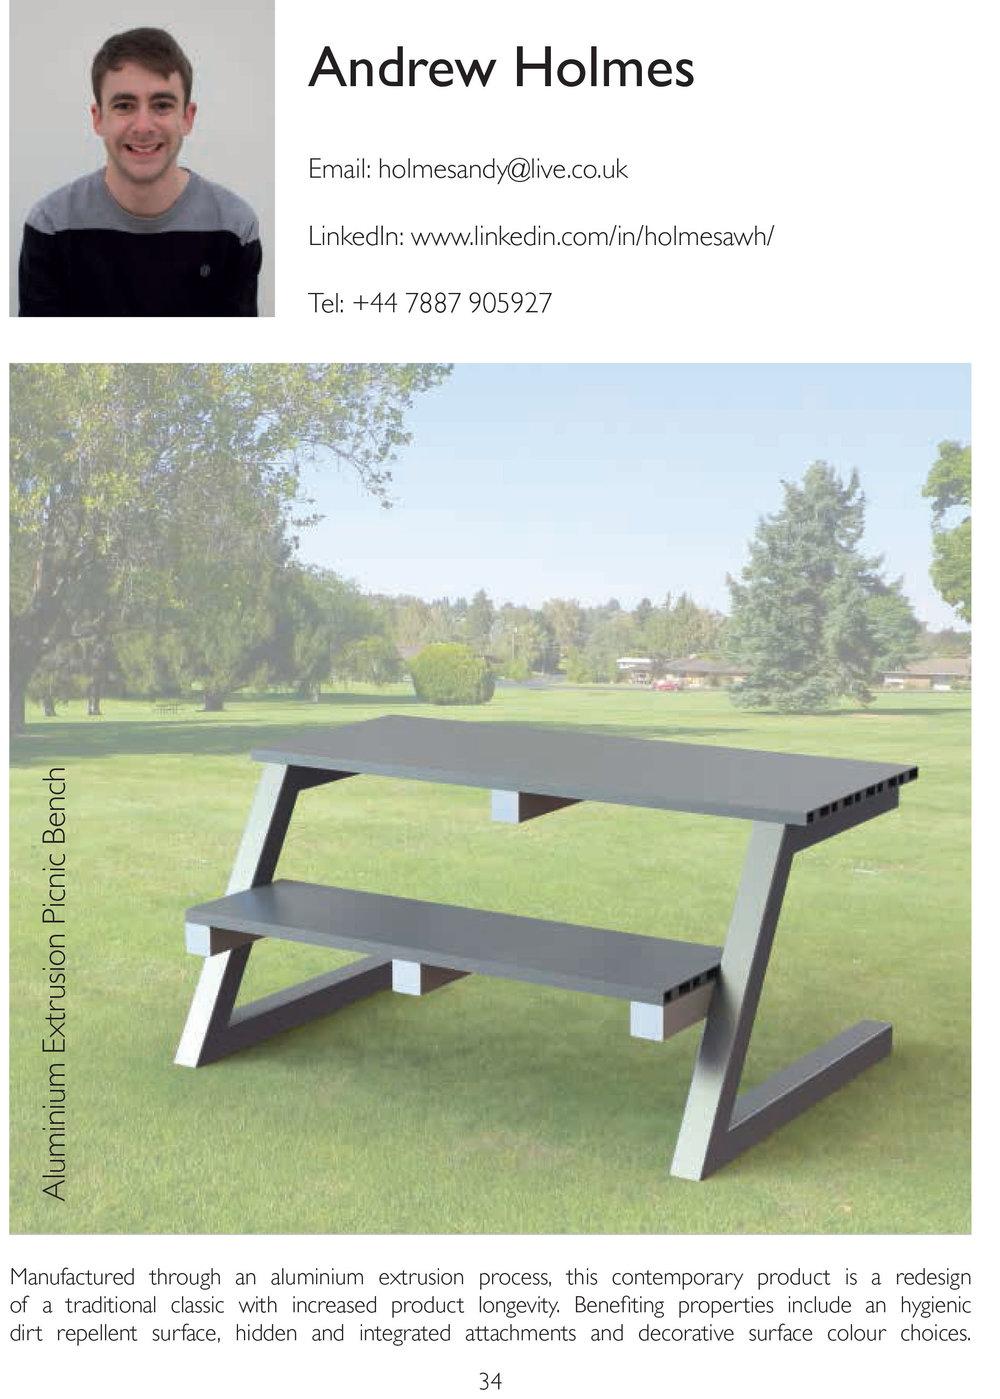 BSc Product Design - Brochure - NTU Degree Show 2017-36.jpg